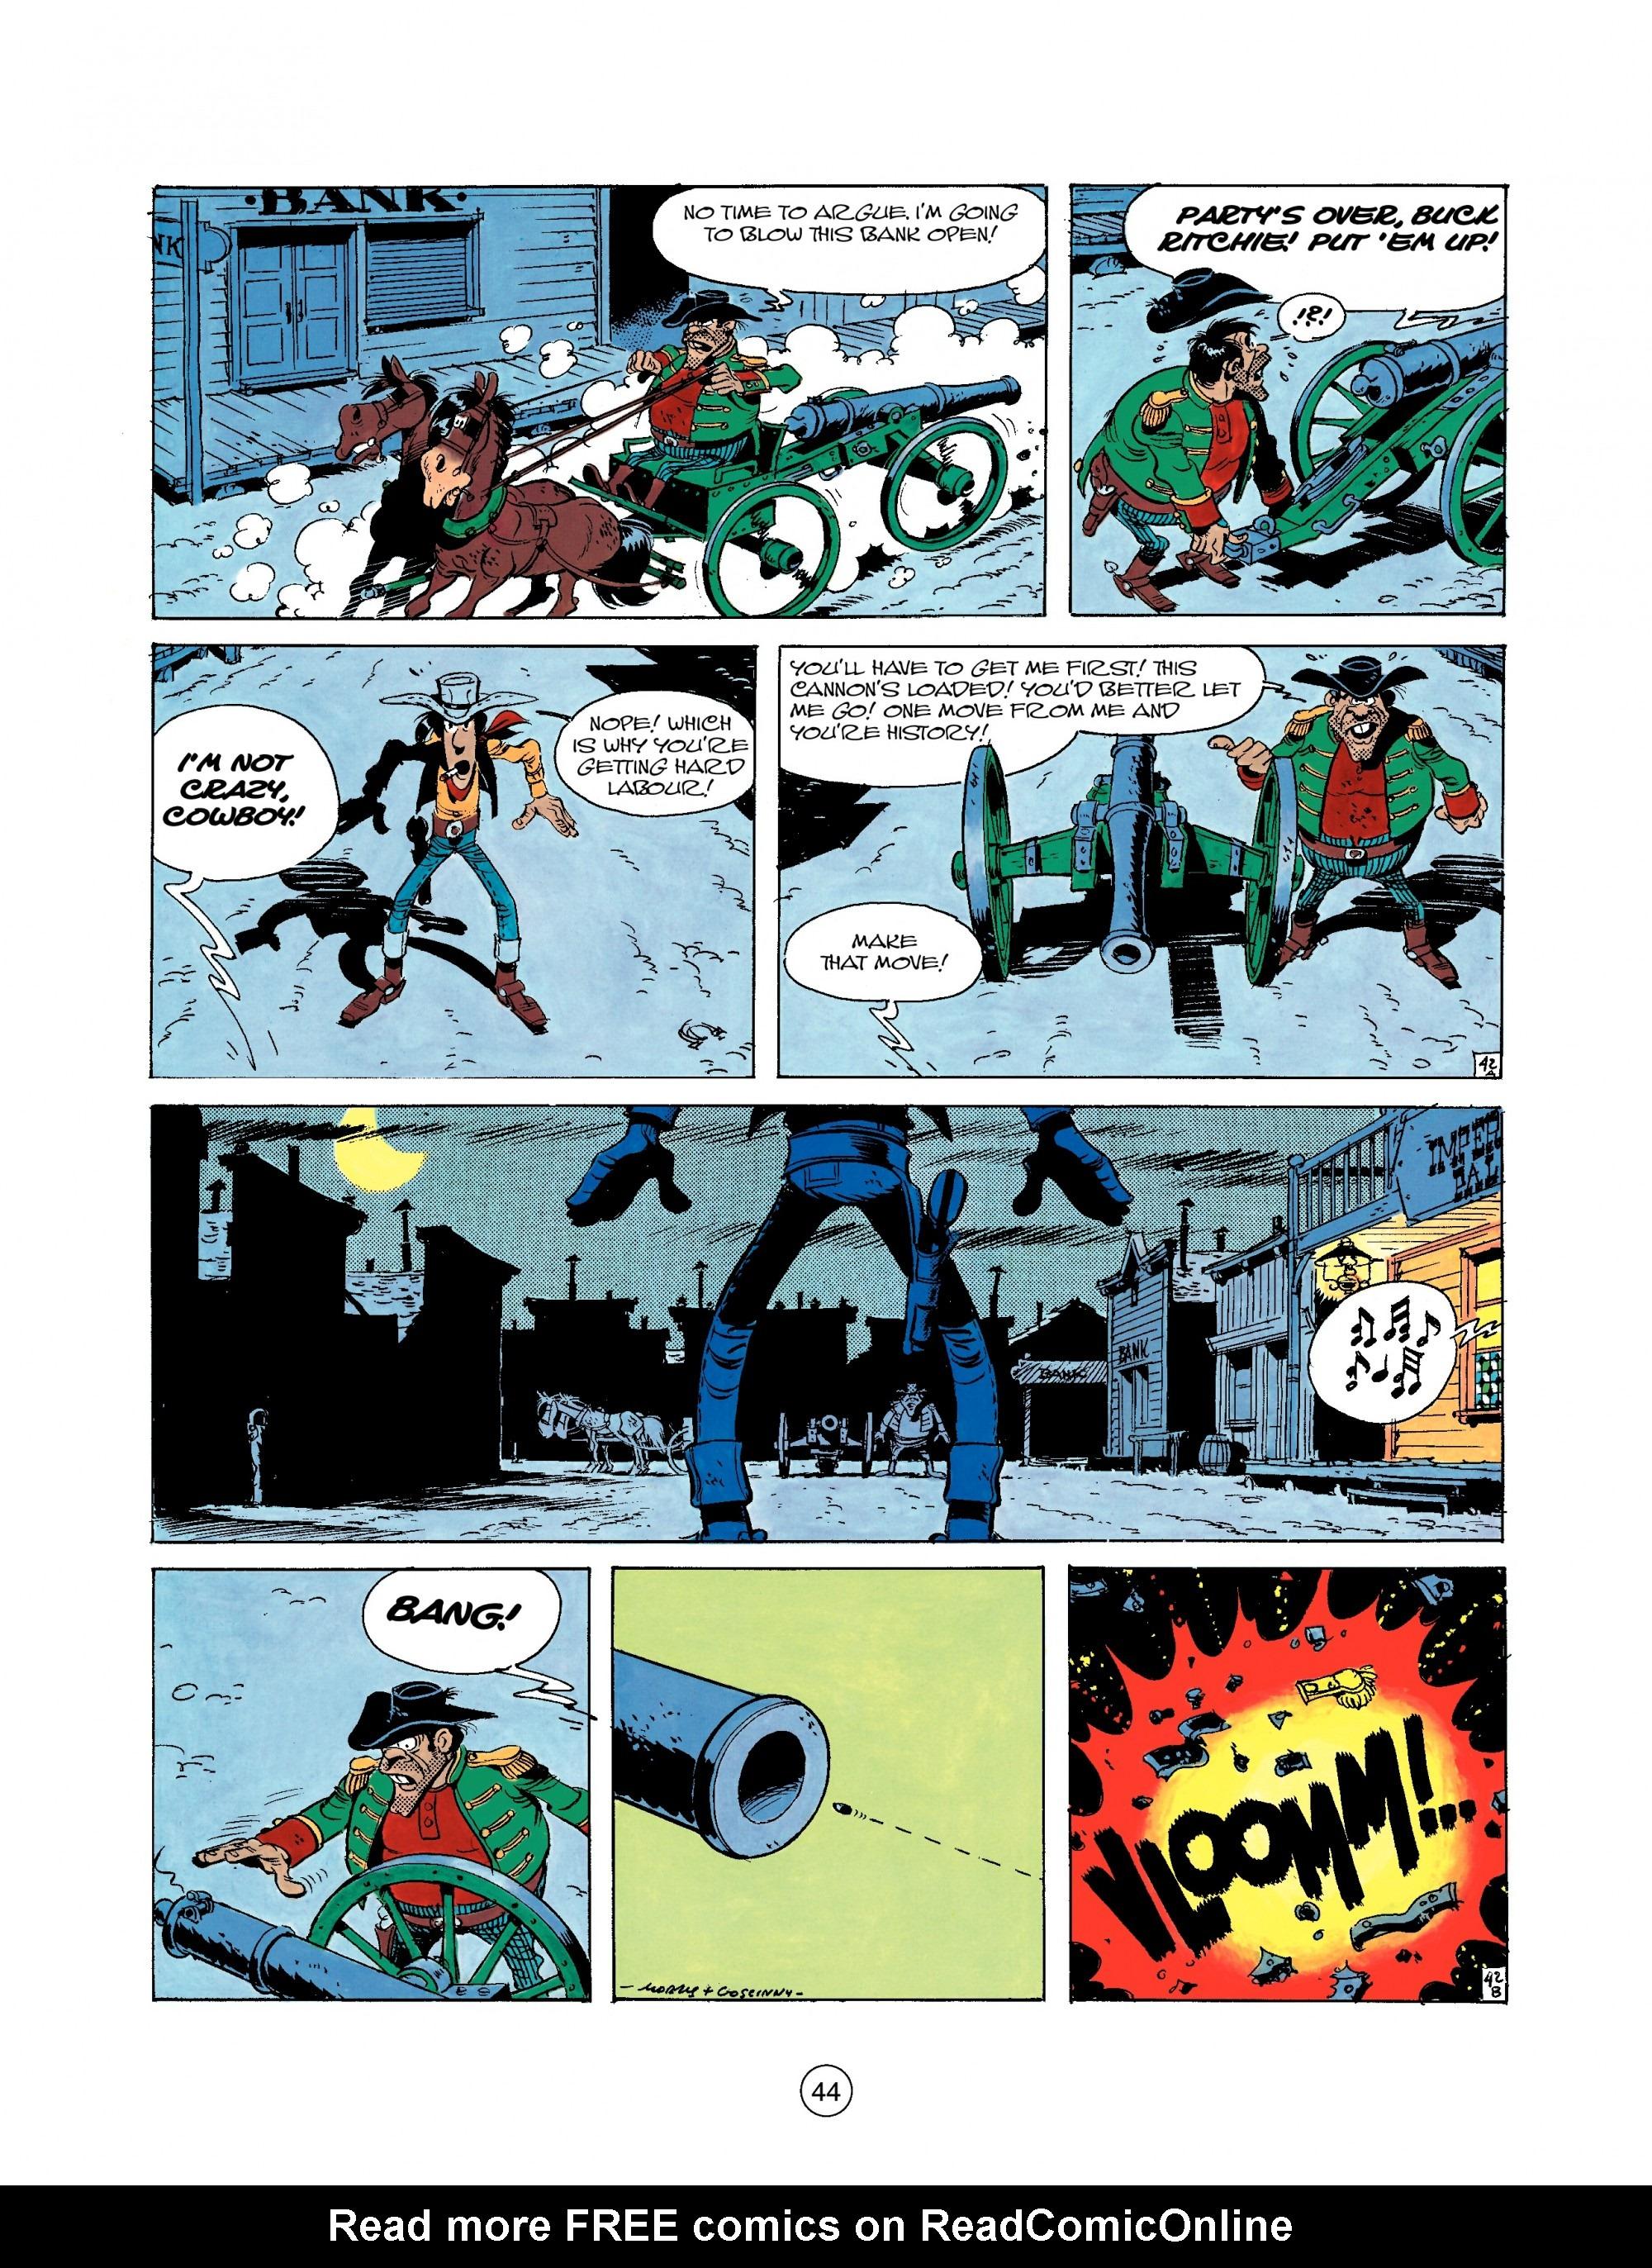 A Lucky Luke Adventure 22 Page 43